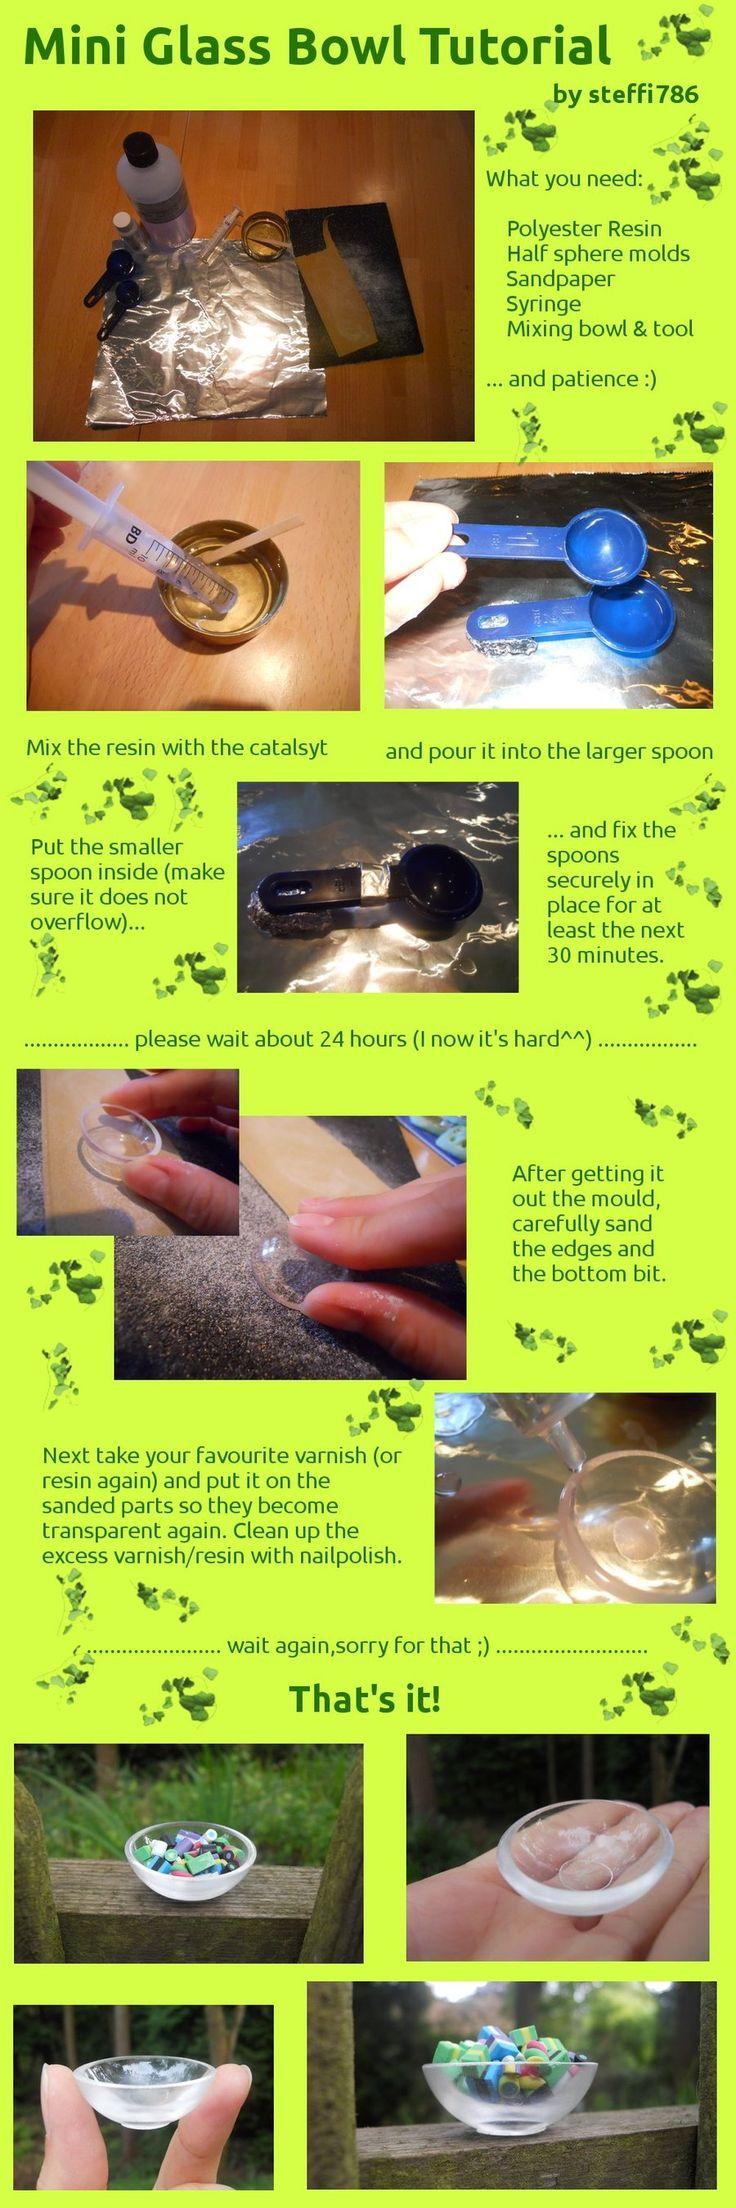 Mini Glass Bowl Tutorial by steffi786.deviantart.com on @deviantART